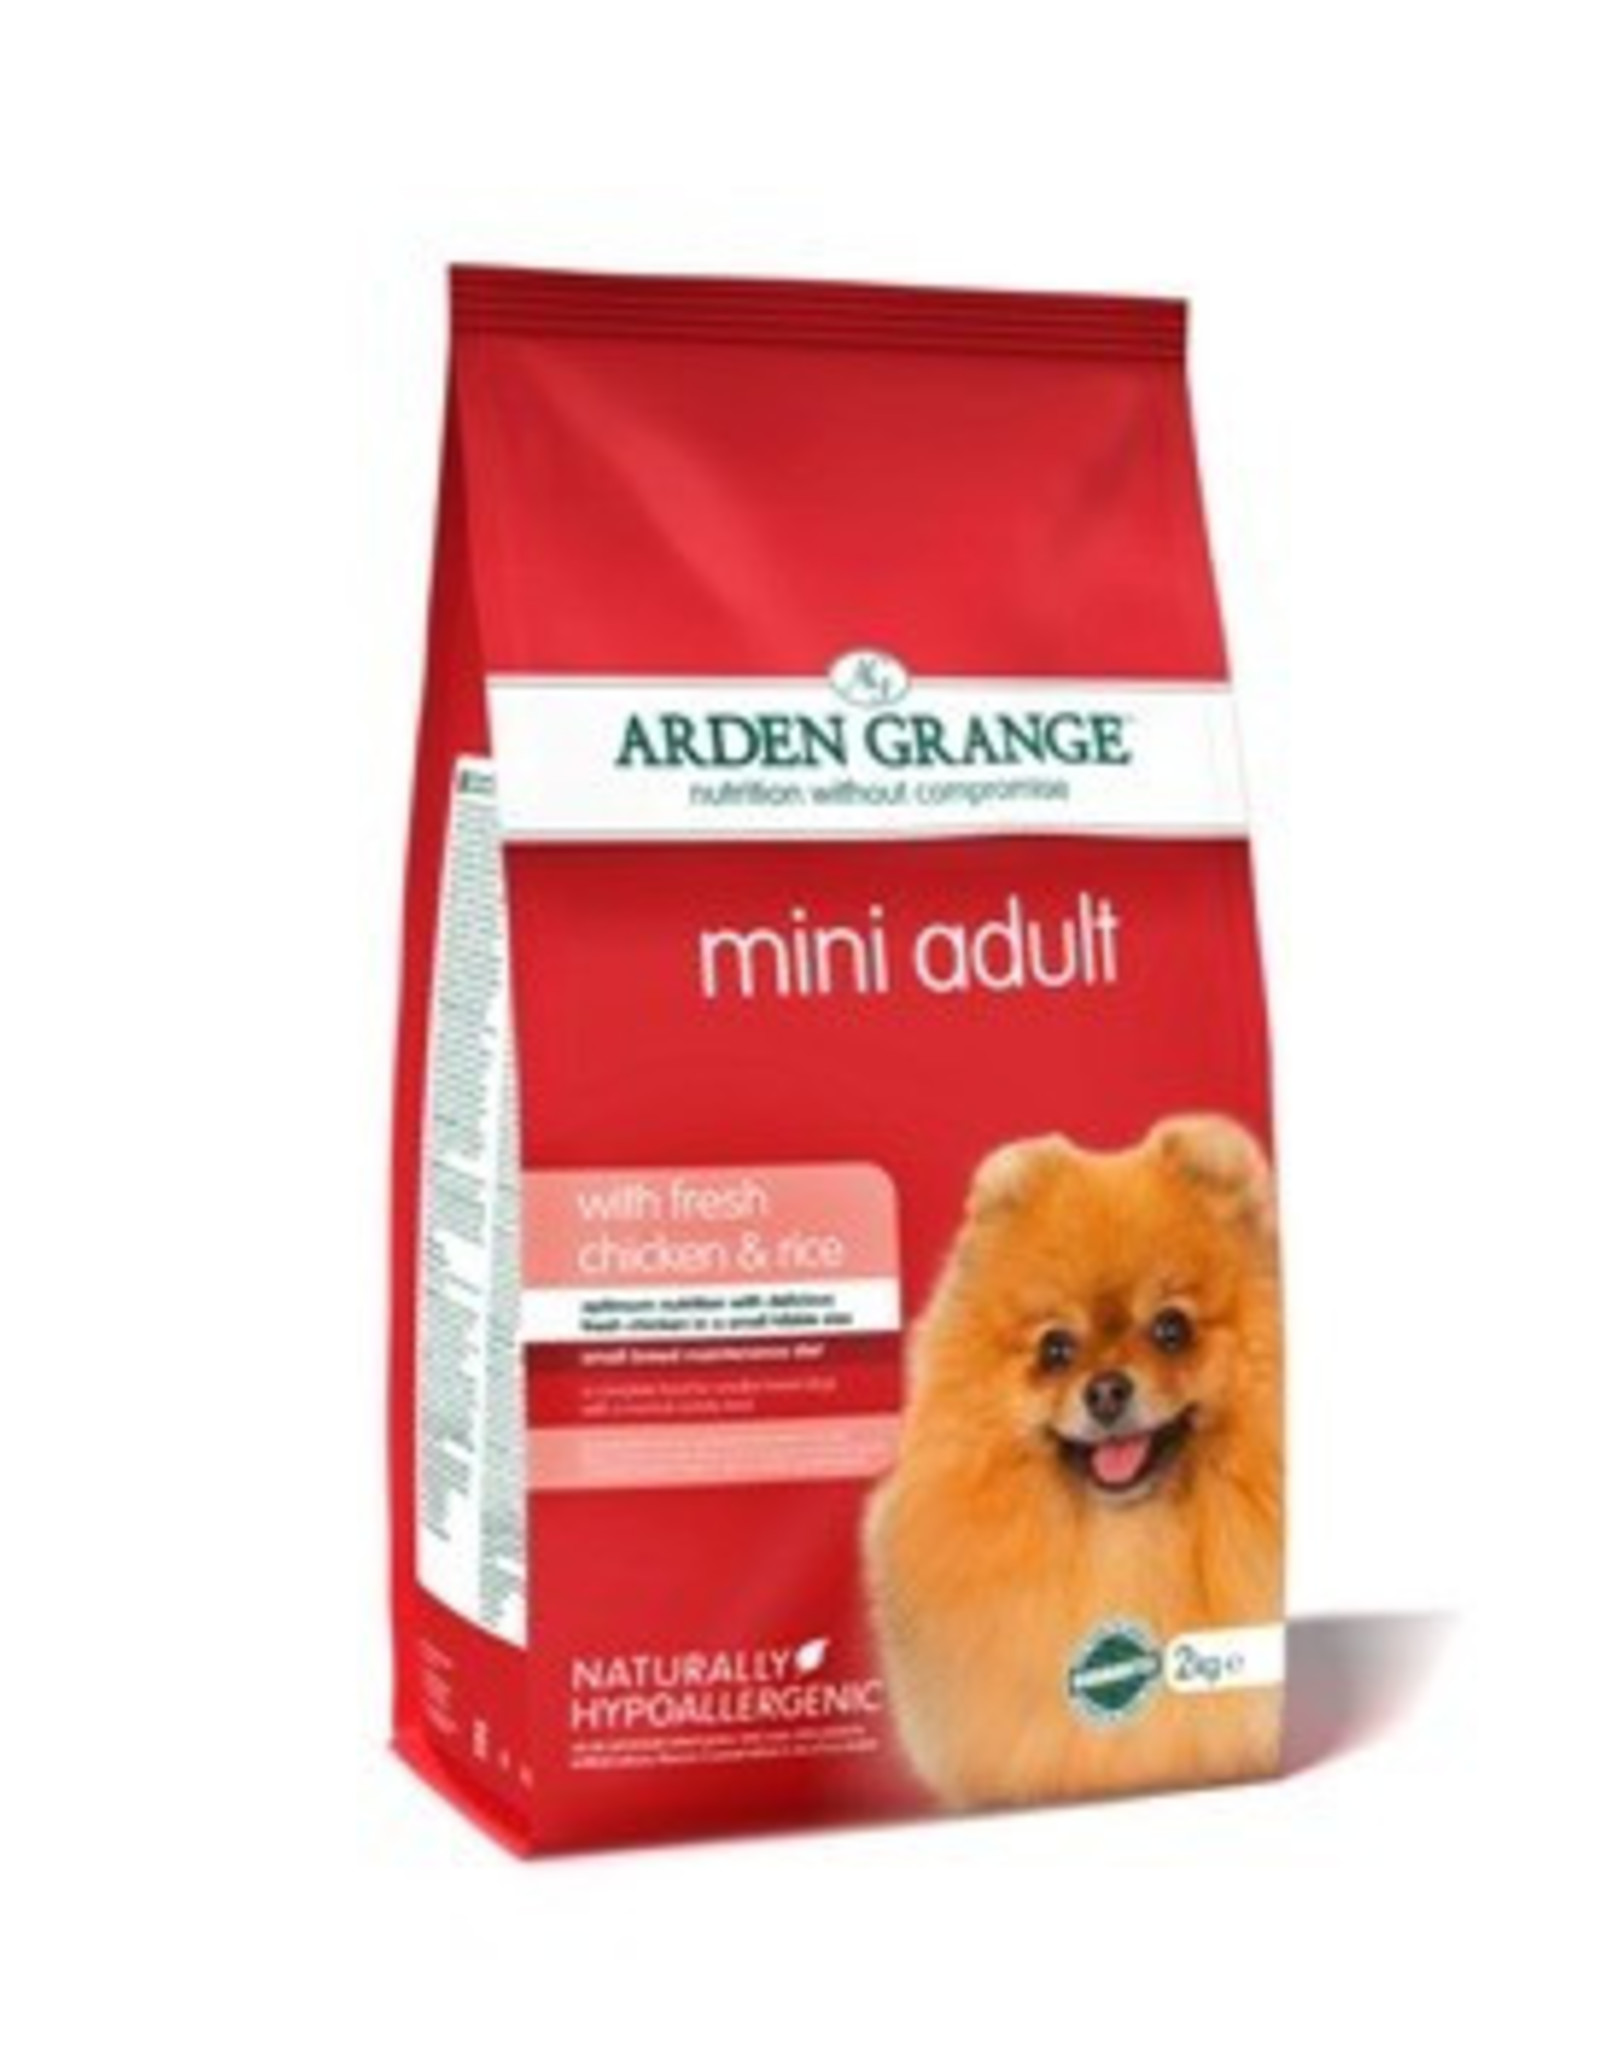 Arden Grange Adult Mini Dog Dry Food, Chicken & Rice